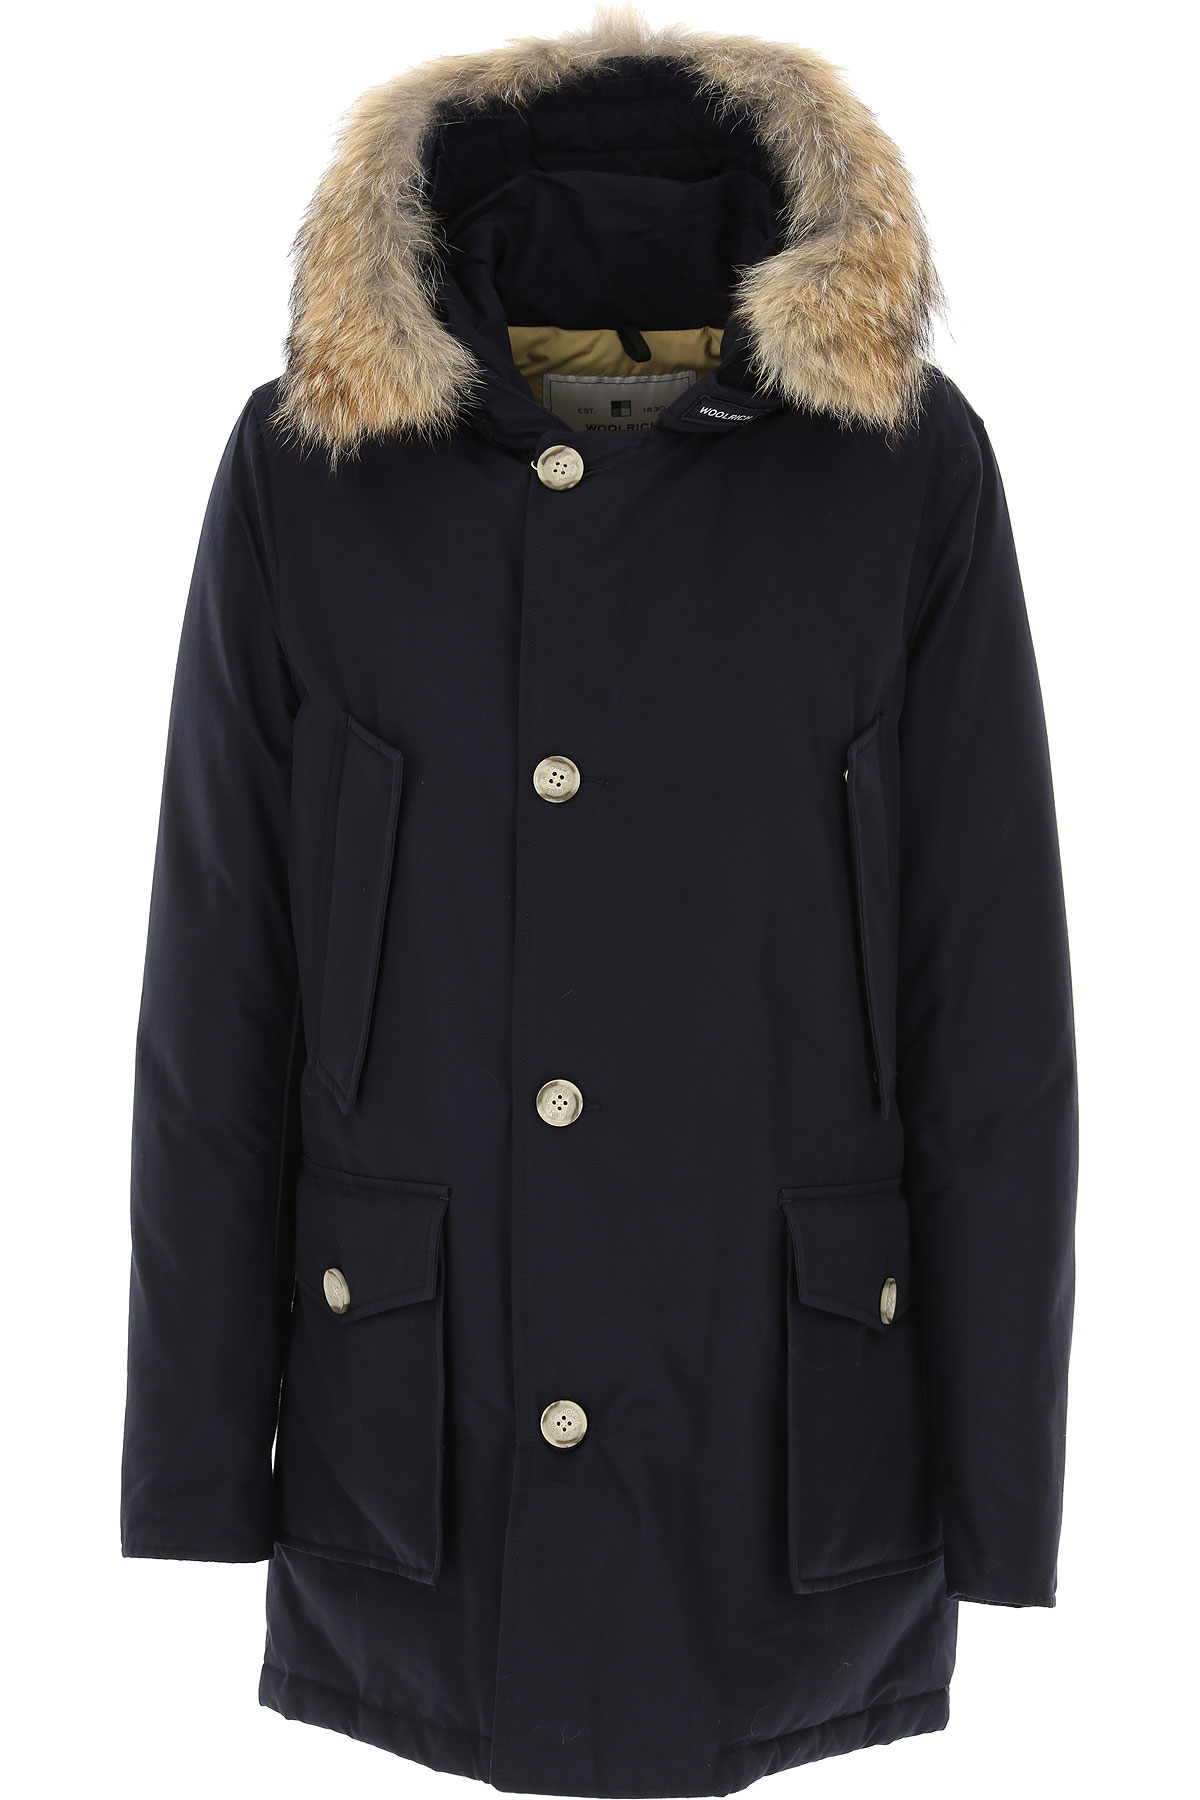 Woolrich Down Jacket for Men, Puffer Ski Jacket, Navy Blue, Duck Down, 2019, L M S XL XS